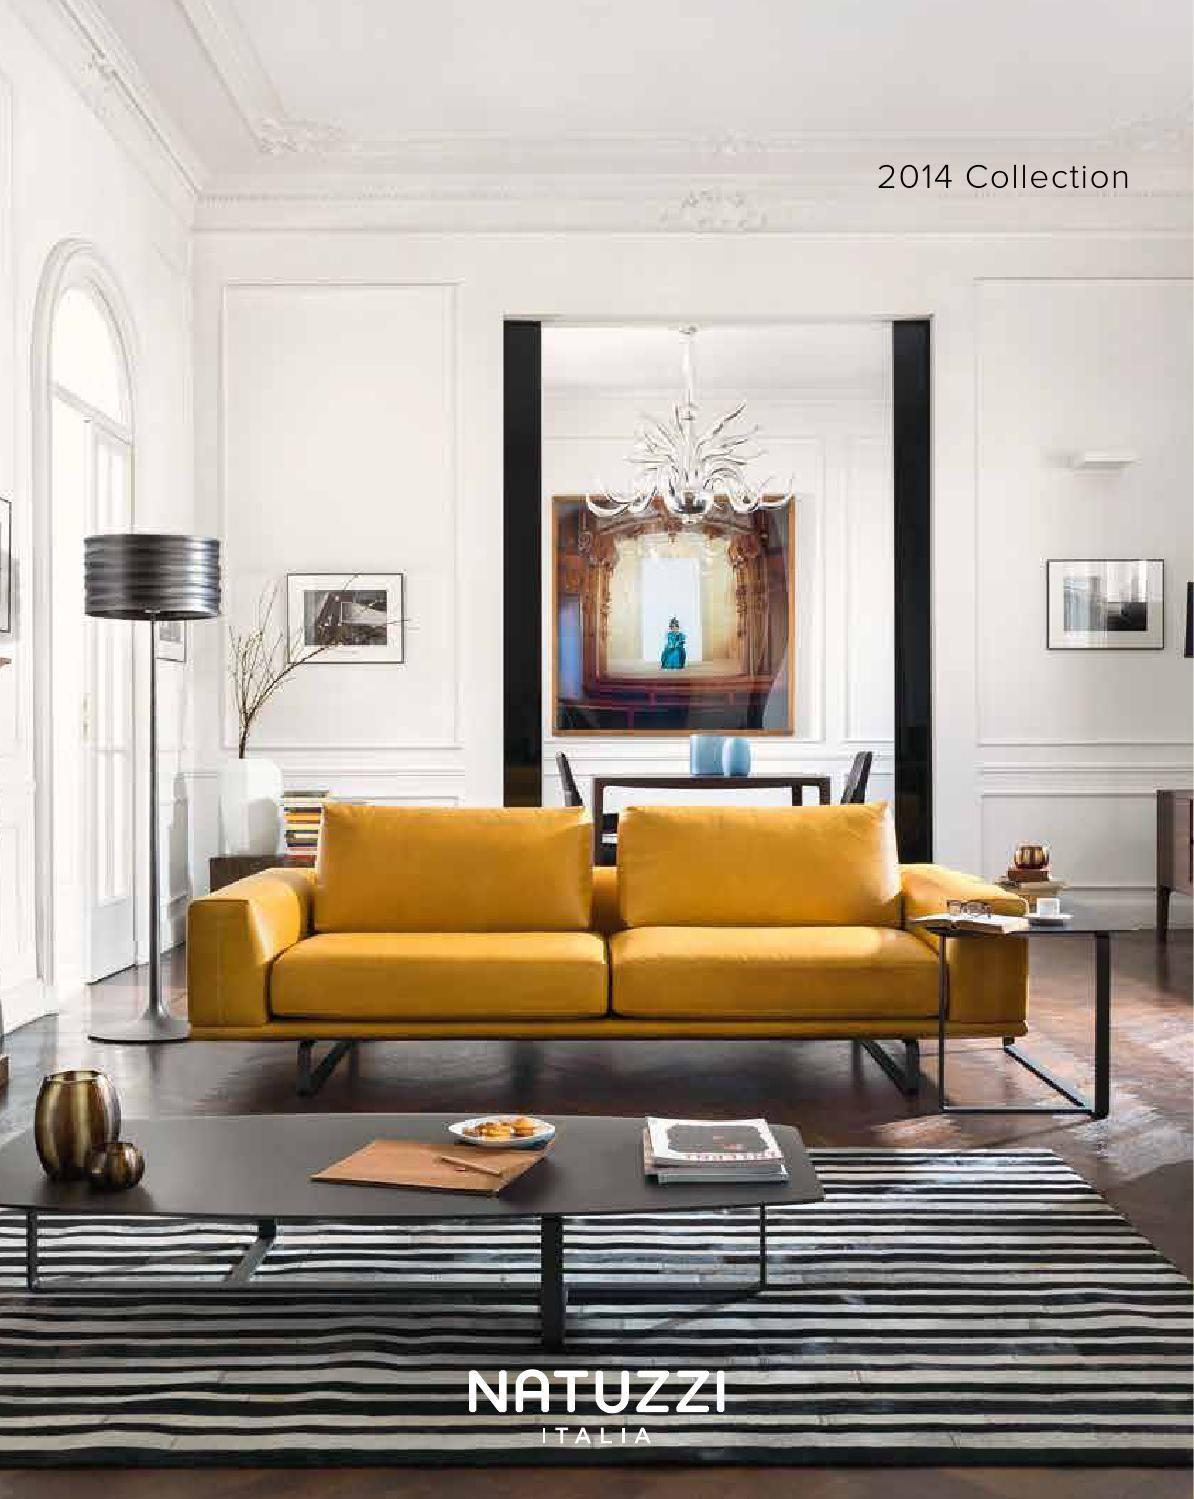 natuzzi tempo sofa oker nappali furniture sofa room rh pinterest com